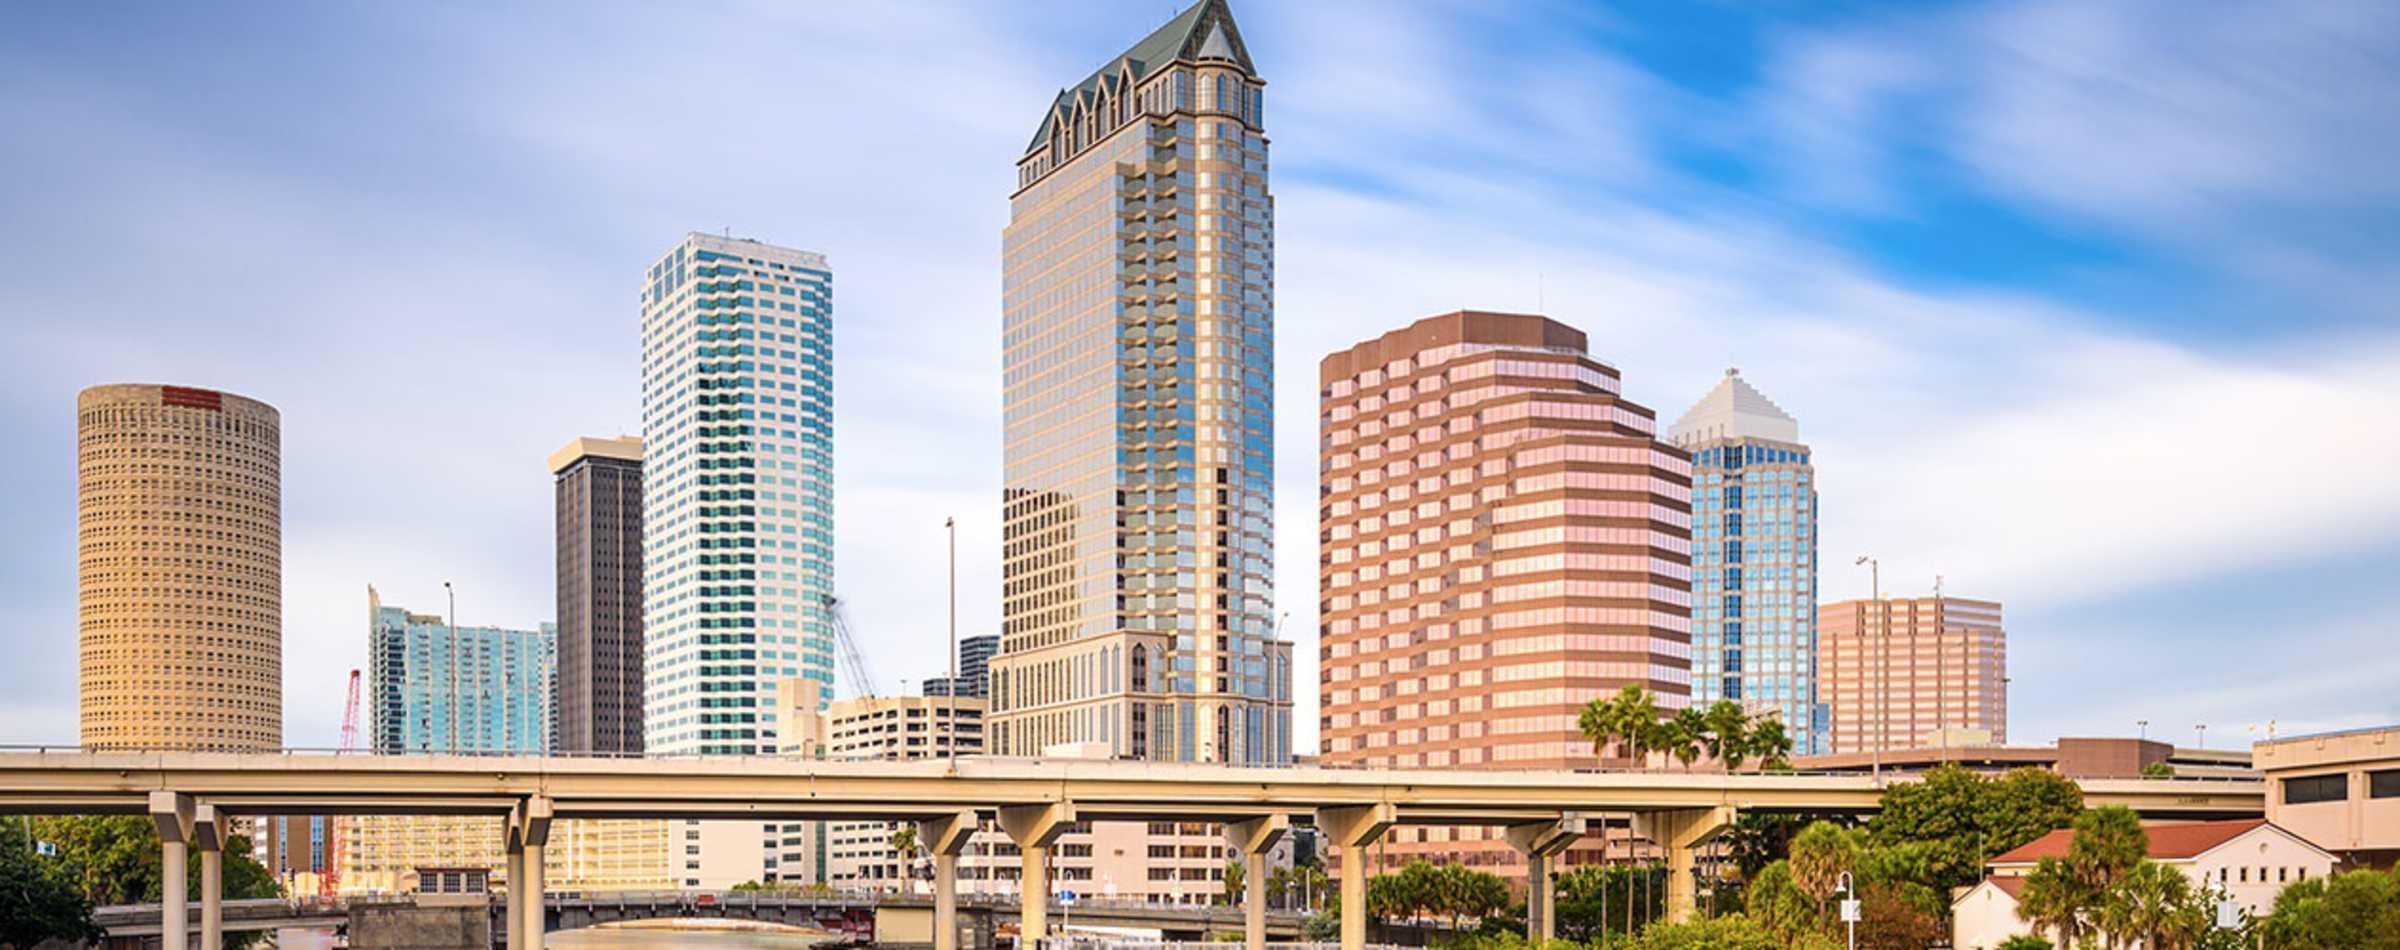 Tampa Downtown Skyline